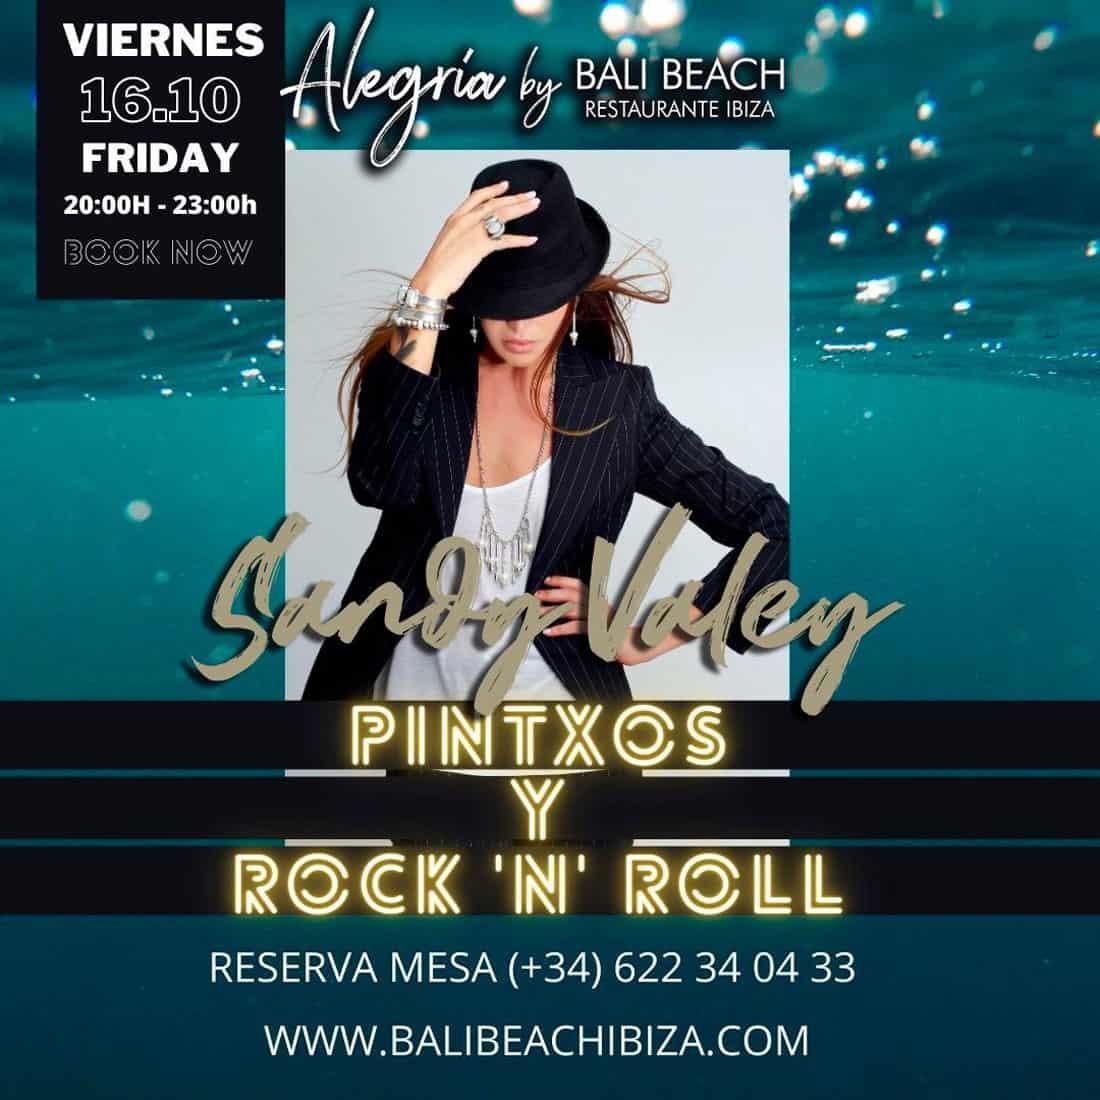 pintxos-y-rock-and-roll-bali-beach-ibiza-2020-welcometoibiza